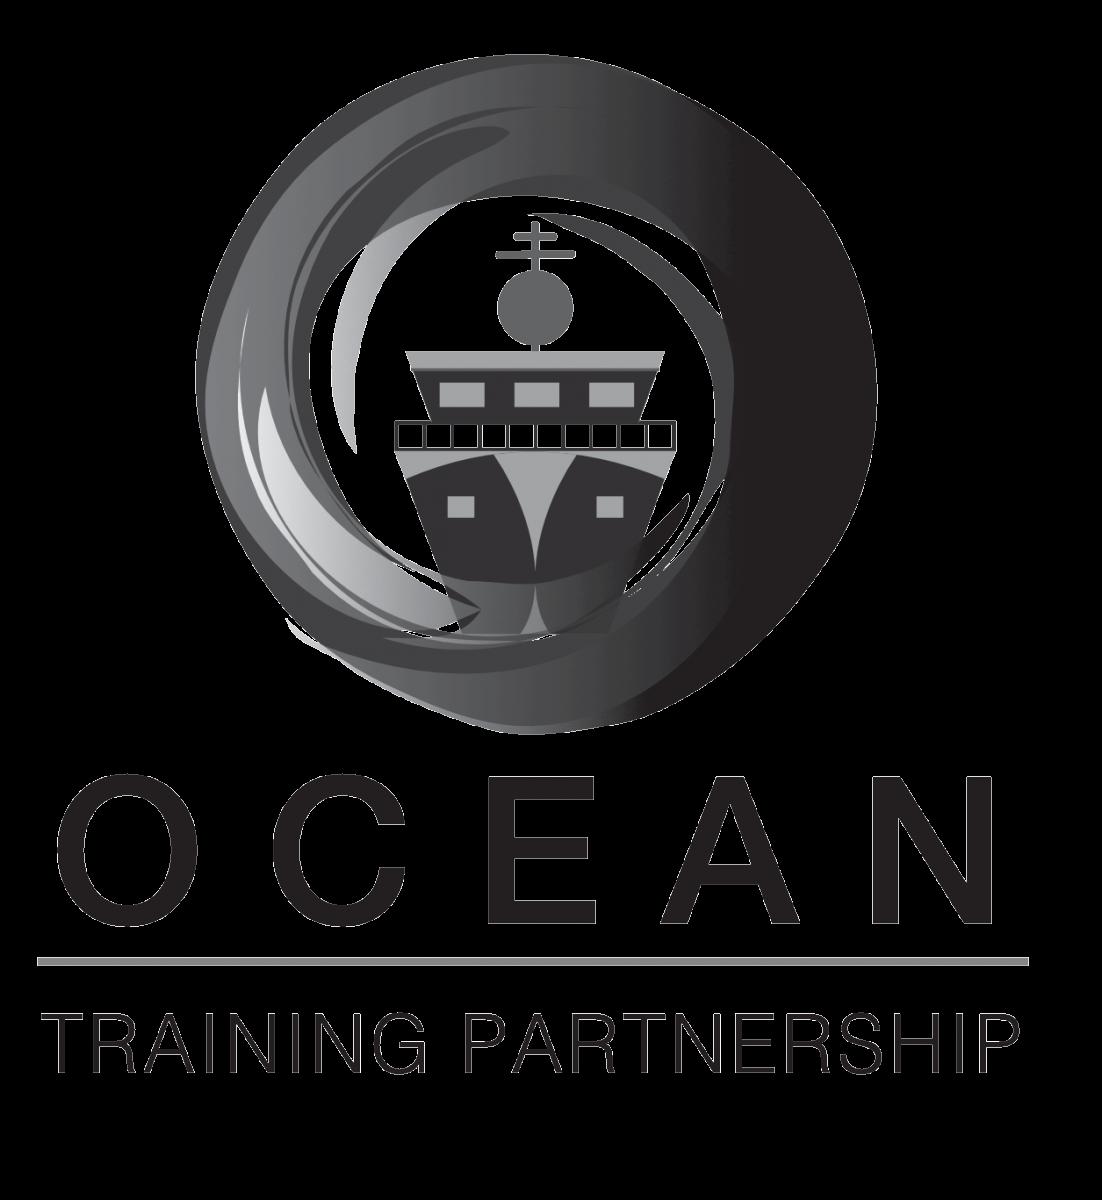 Downloads | Ocean Training Partnership